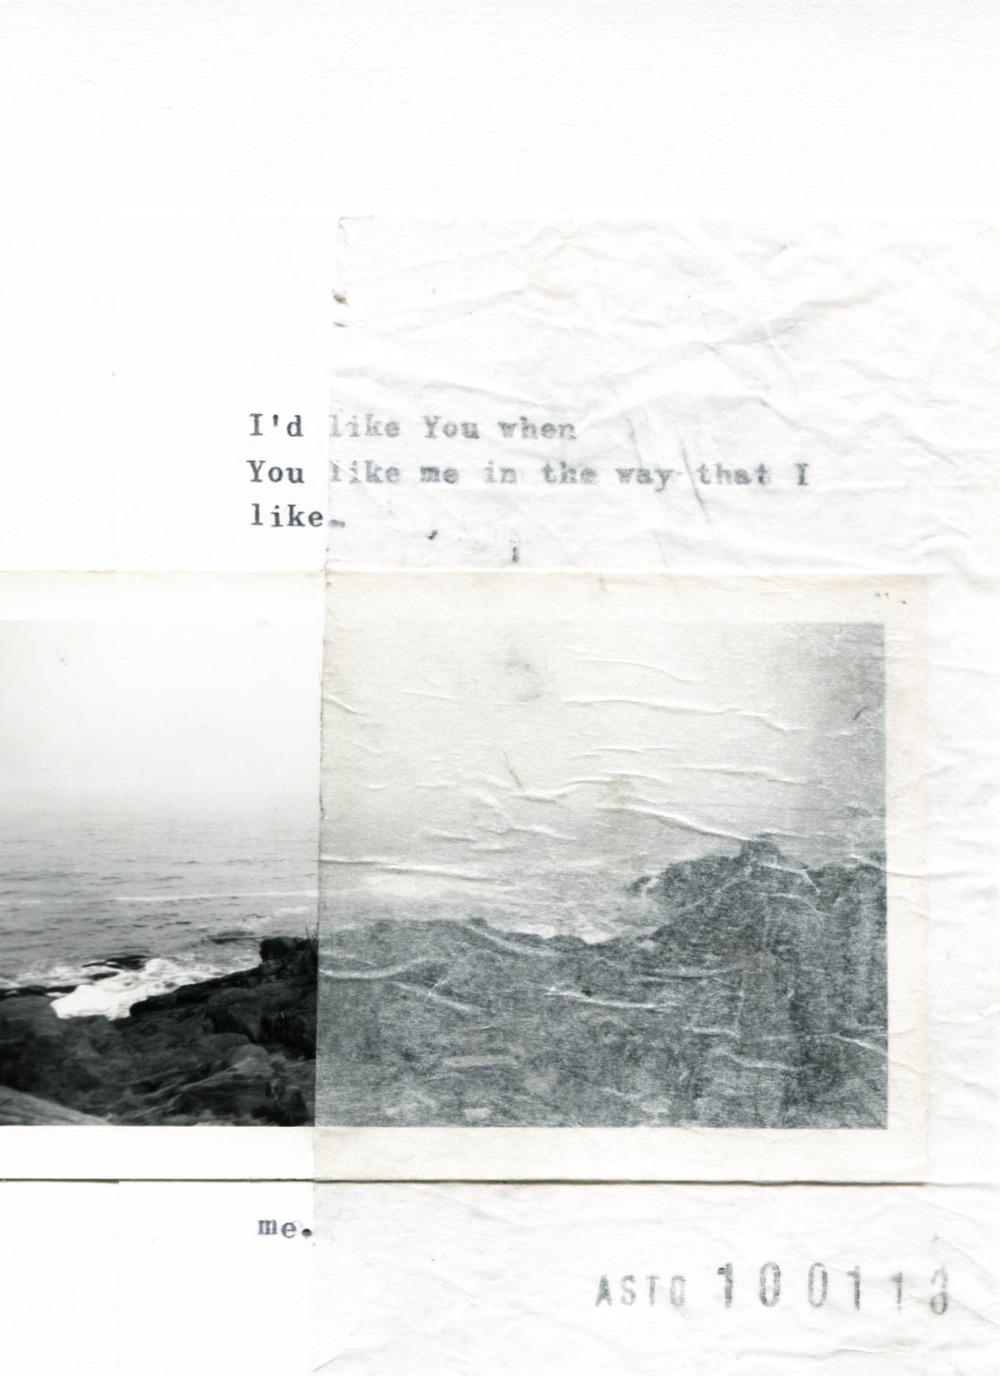 http://anitasto.tumblr.com/